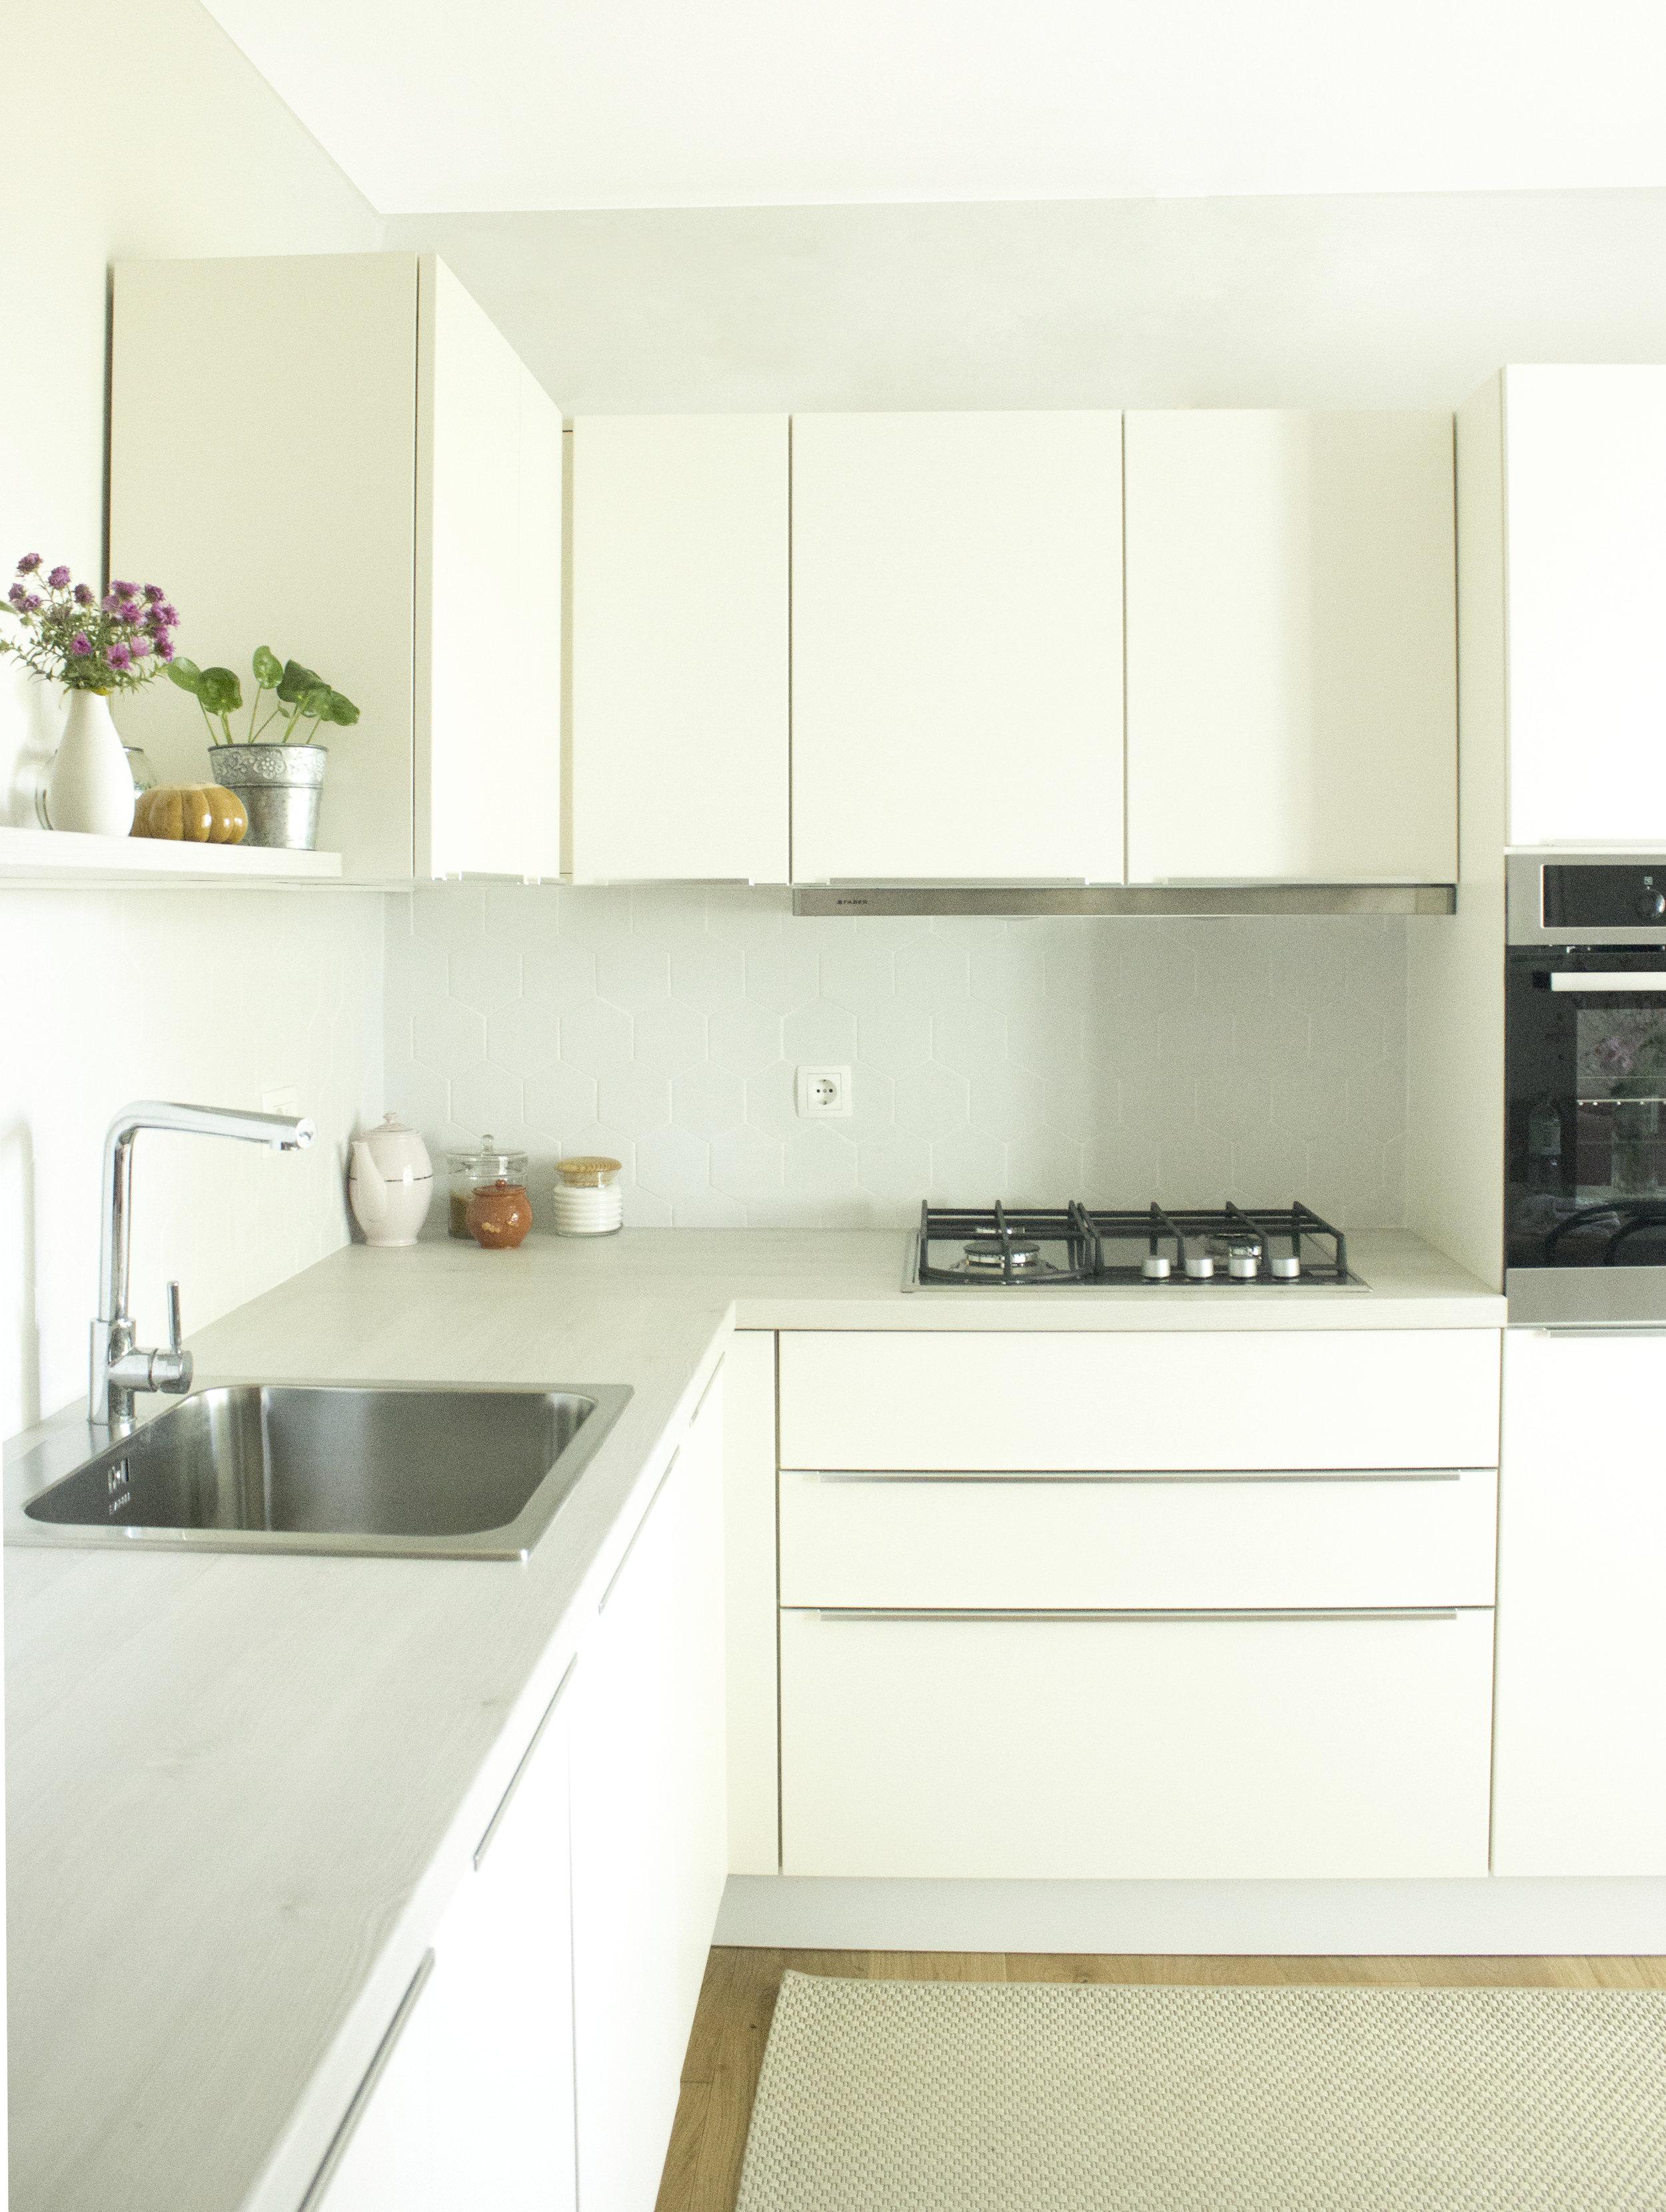 poke studio projekt_ženstvena oaza_kuhinja in jedilnica-2